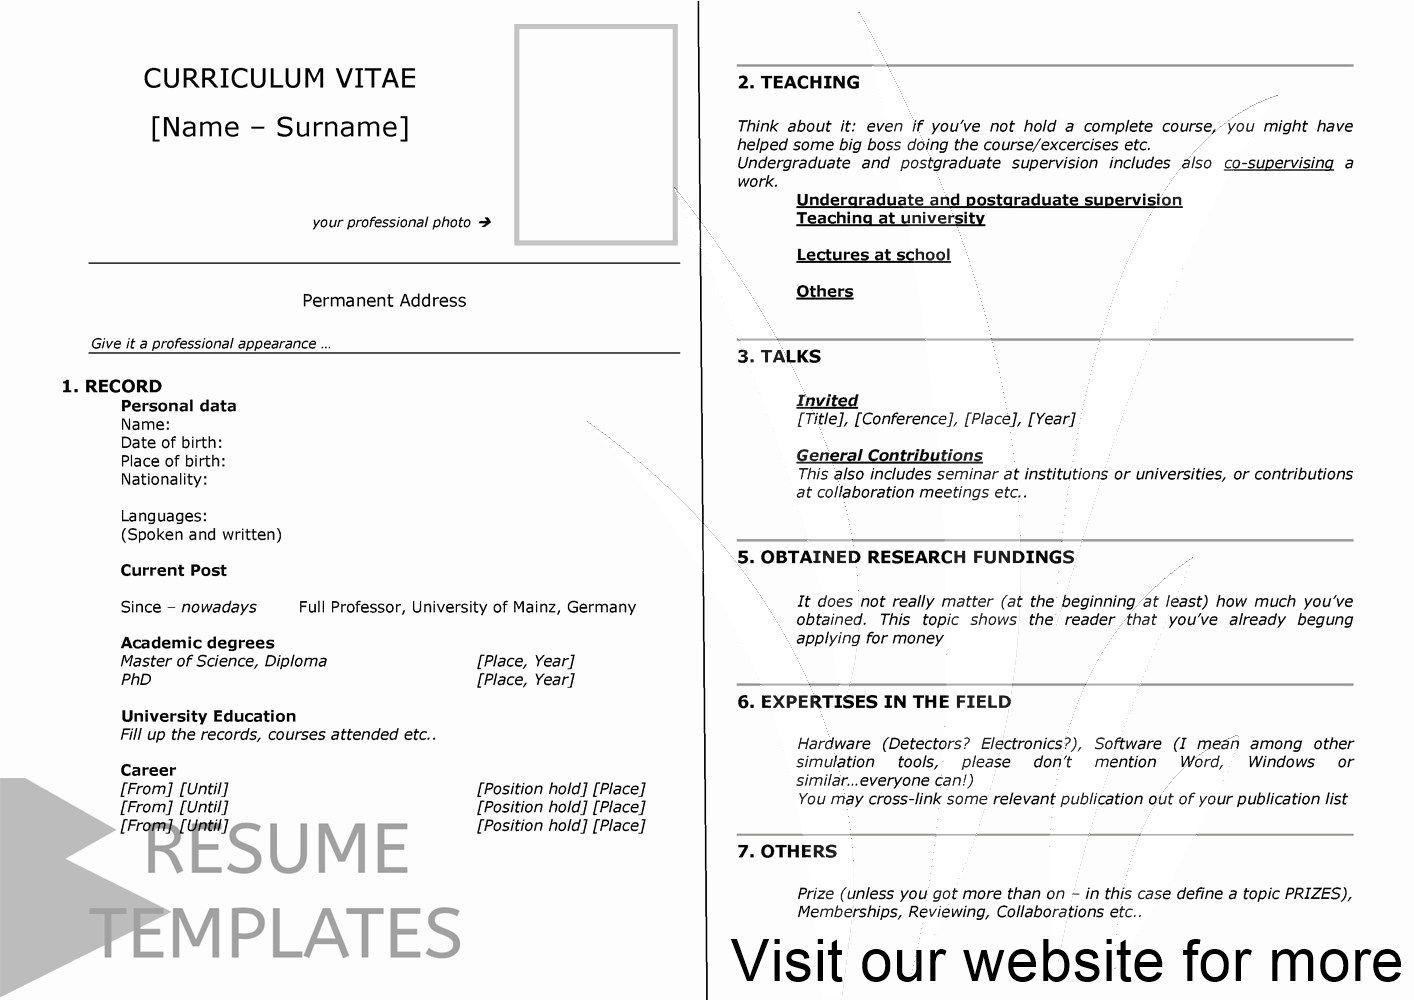 nursing resume template free in 2020 Resume template